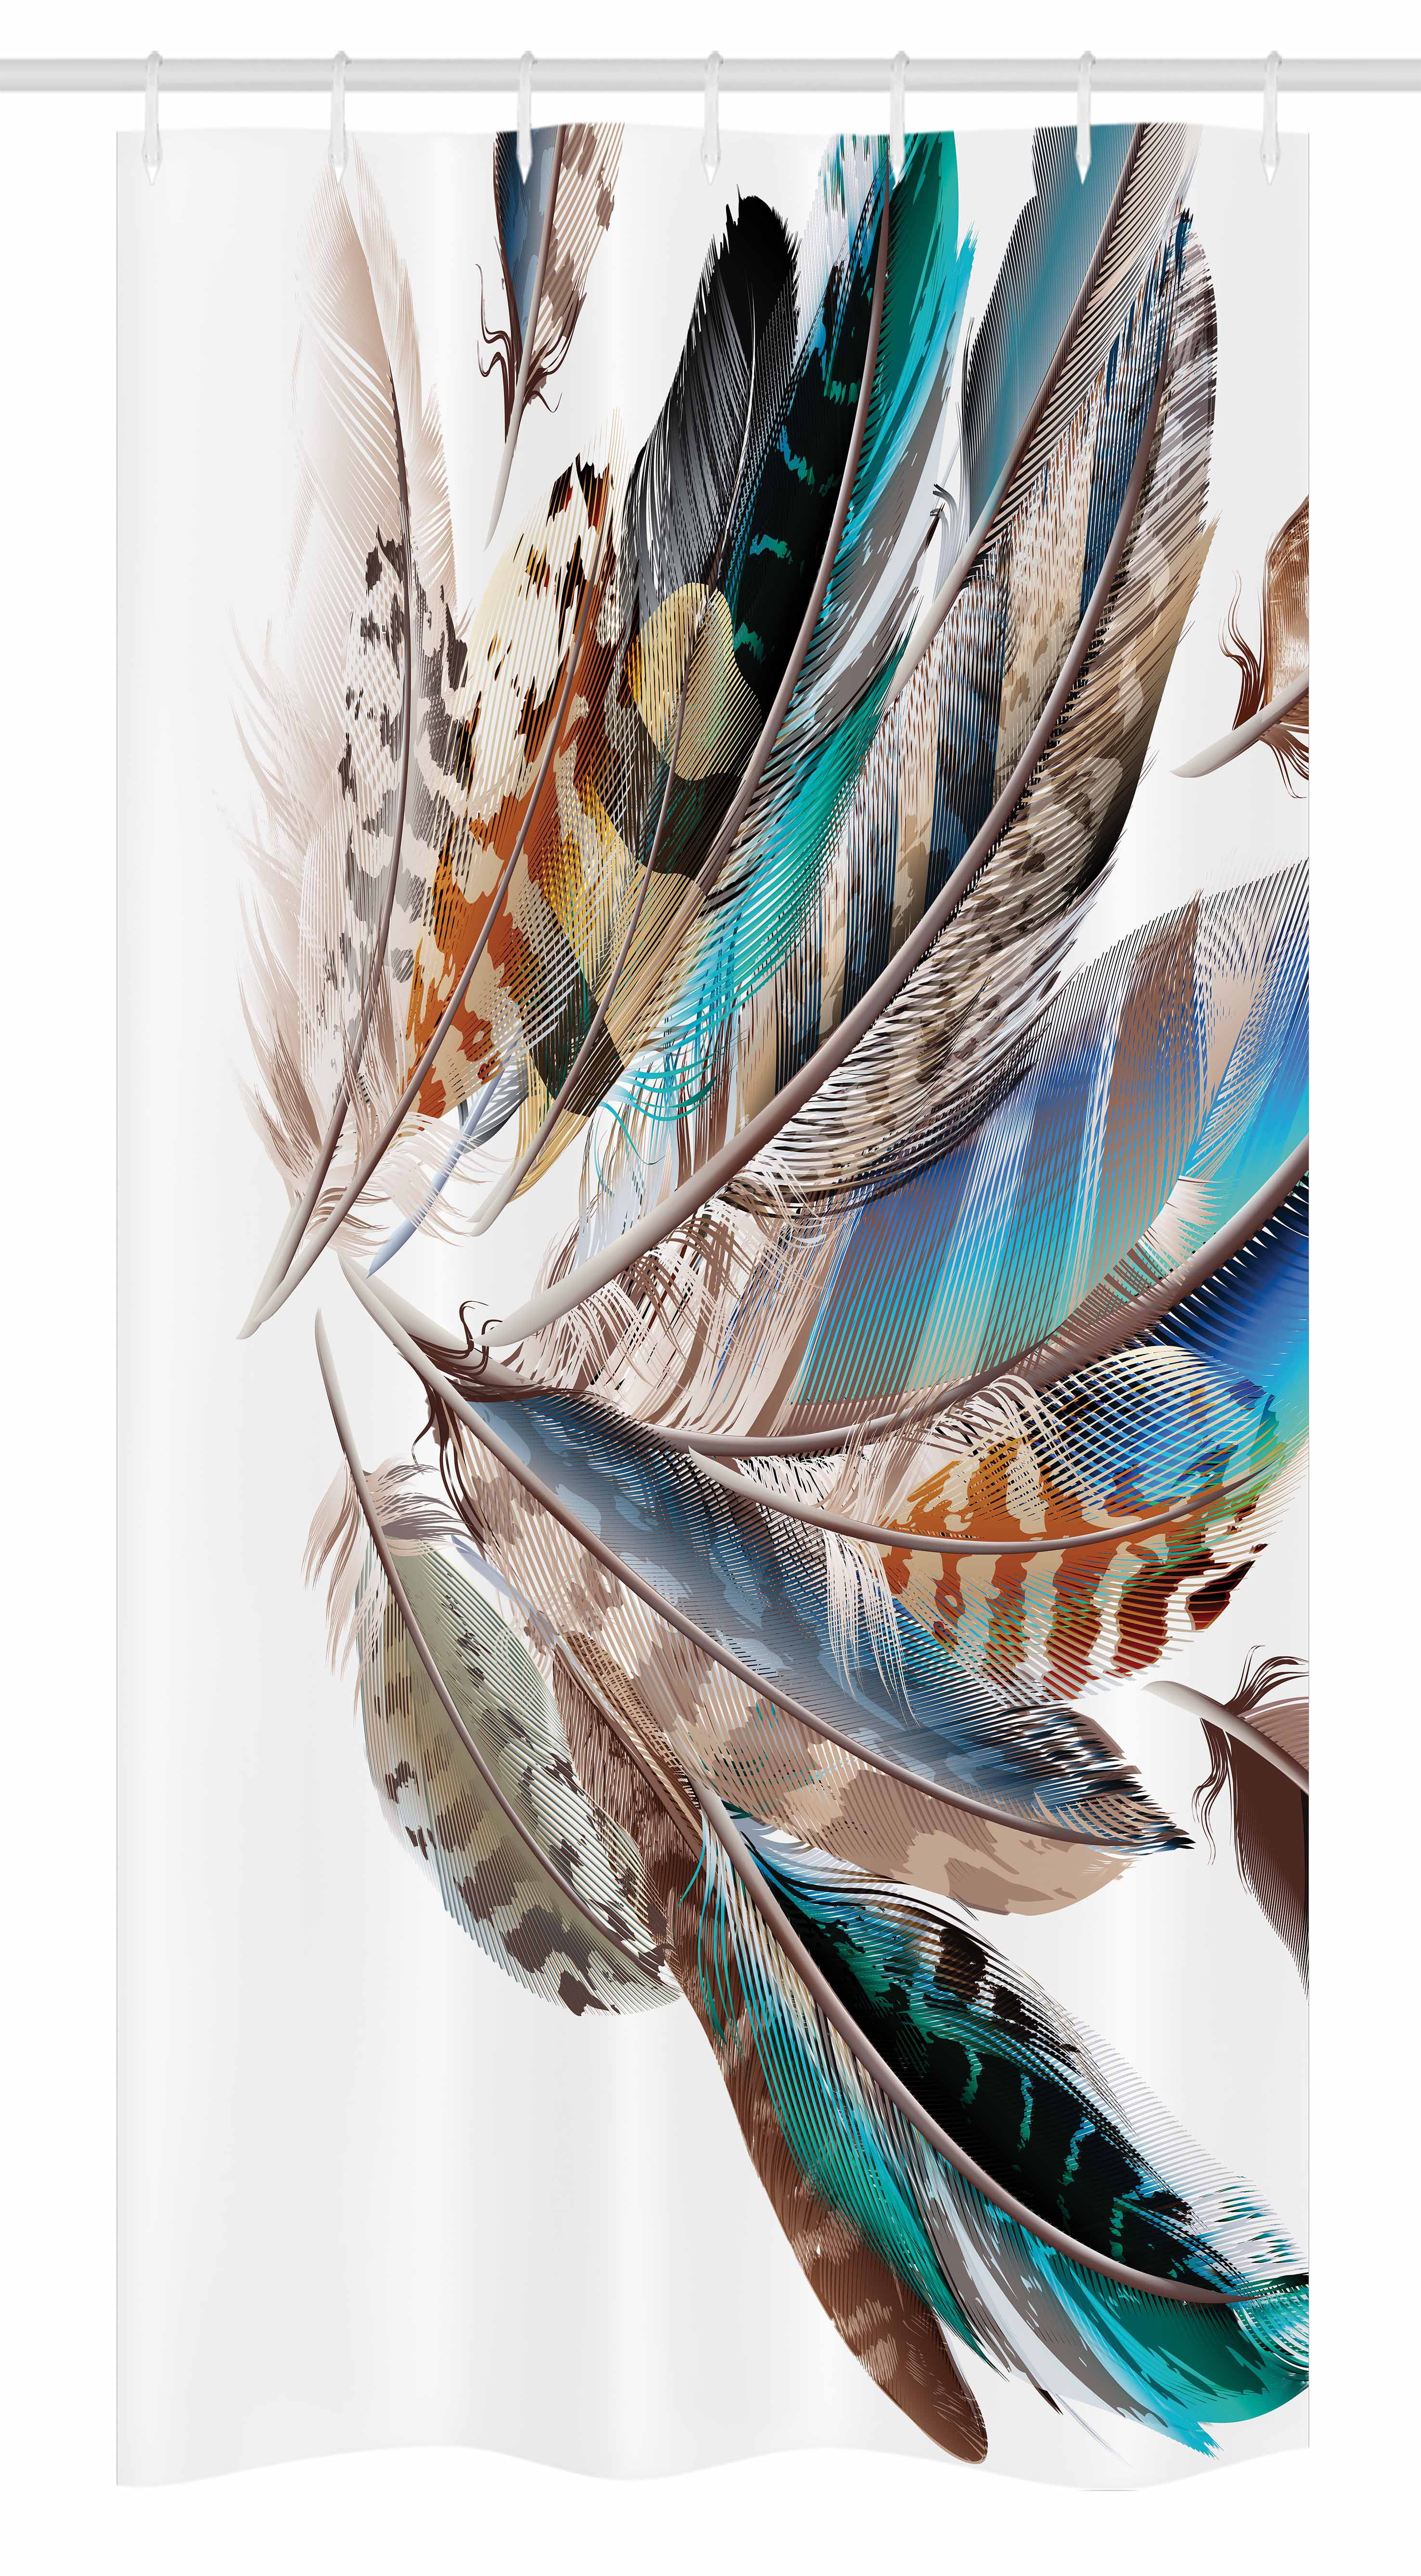 Animal Shower Curtain Contour Feather Fashion Print for Bathroom